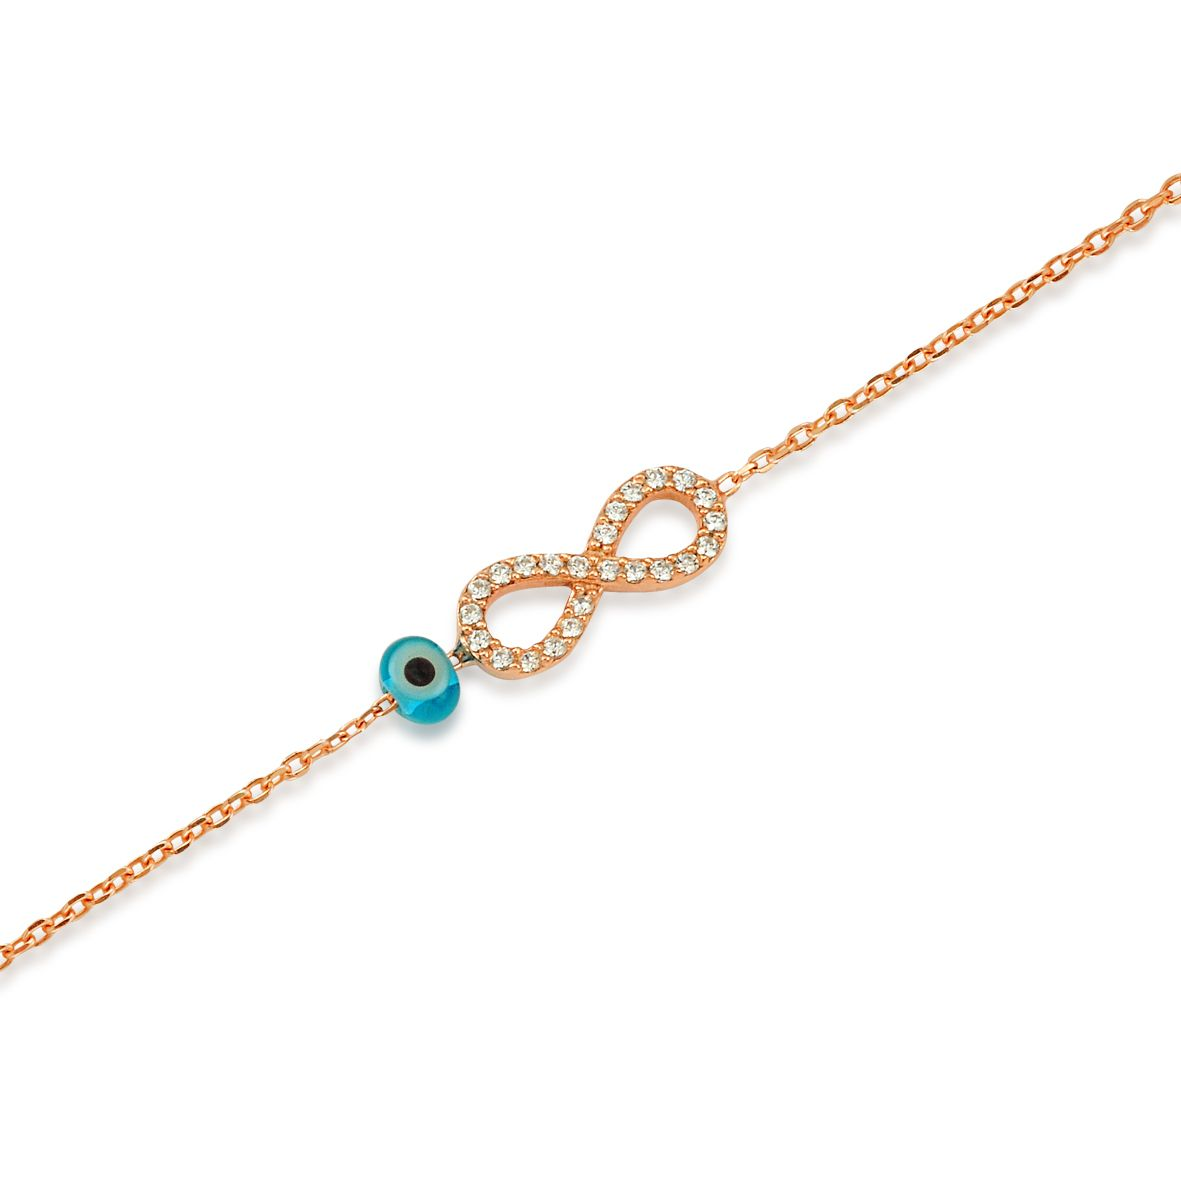 bracelet infini argent 925 plaqu or zirconium et perle bleue vo. Black Bedroom Furniture Sets. Home Design Ideas